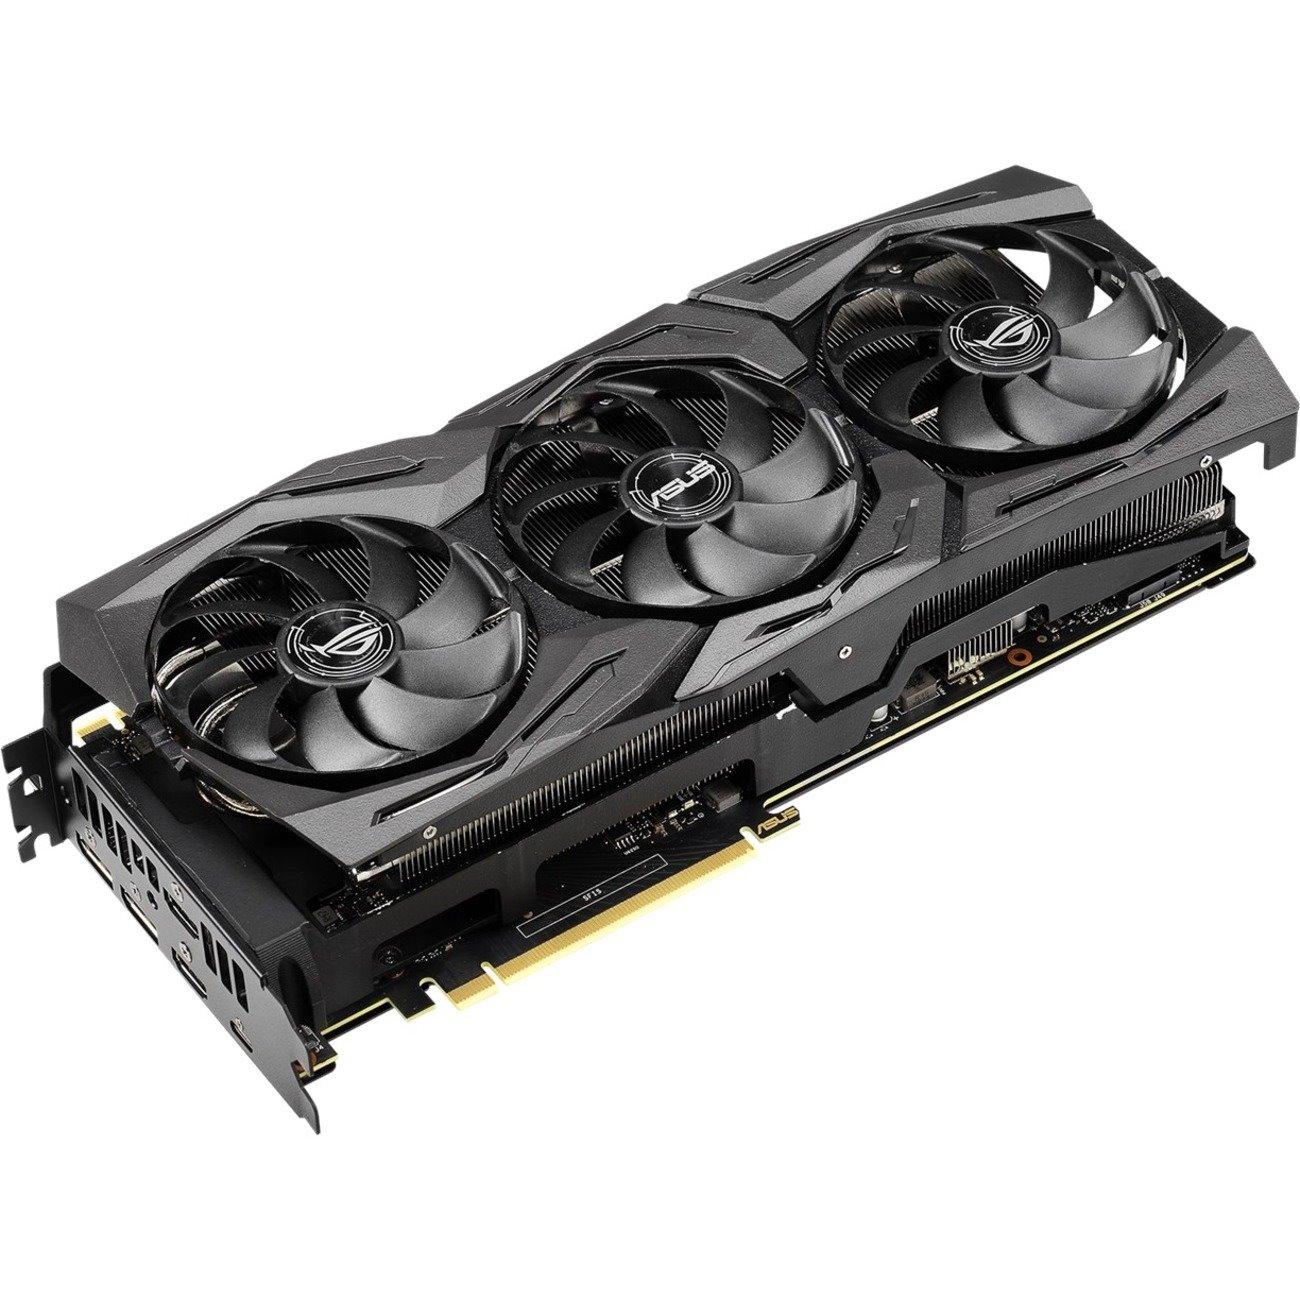 Asus ROG Strix ROG-STRIX-RTX2080TI-A11G-GAMING GeForce RTX 2080 Ti Graphic Card - 11 GB GDDR6